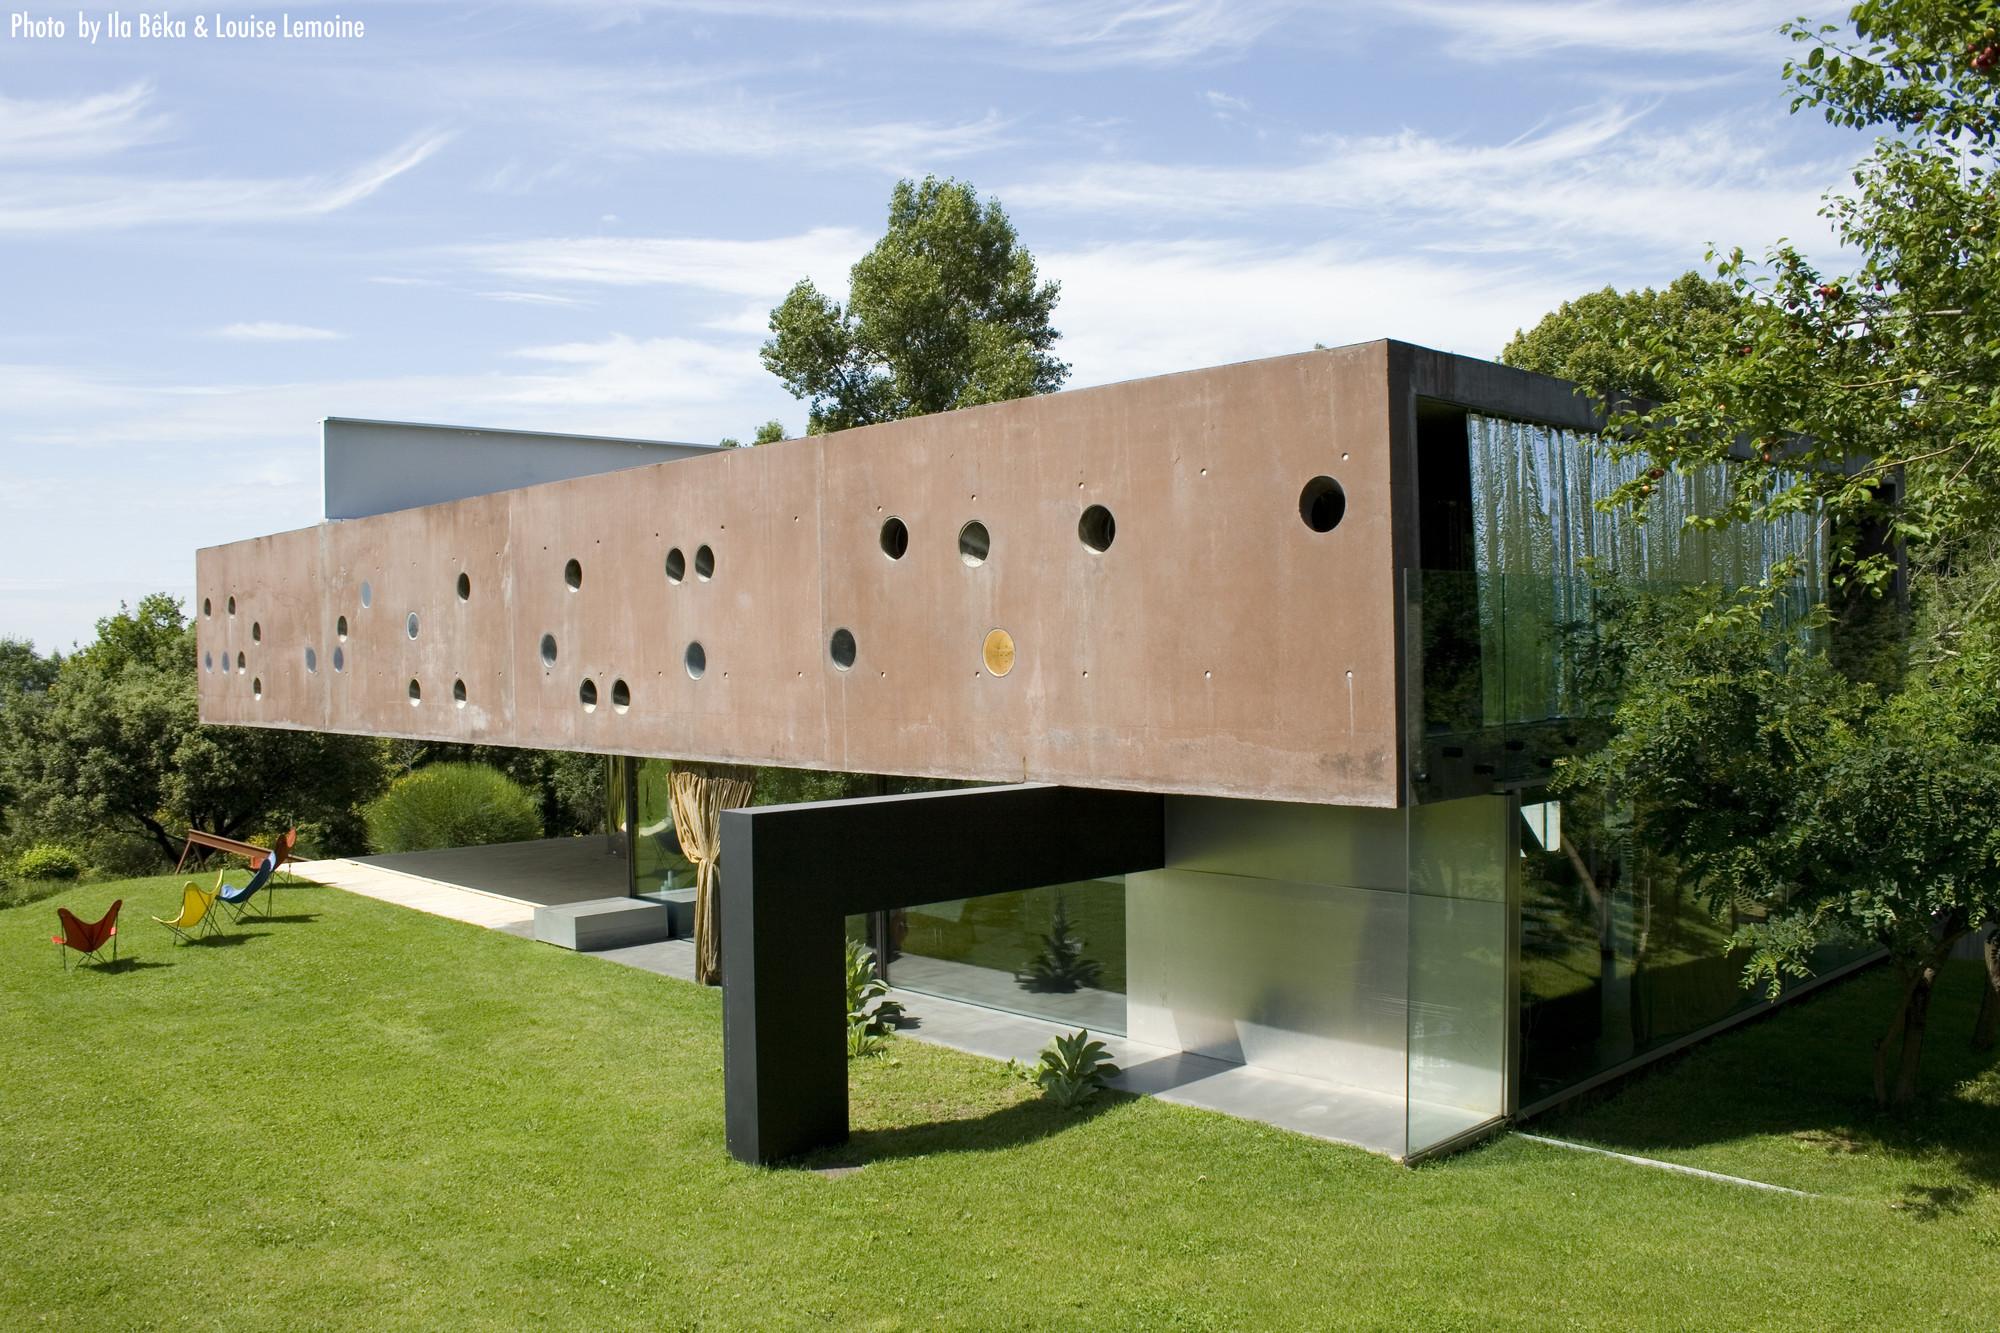 House in Bordeaux -  Ila Beka & Louise Lemoine